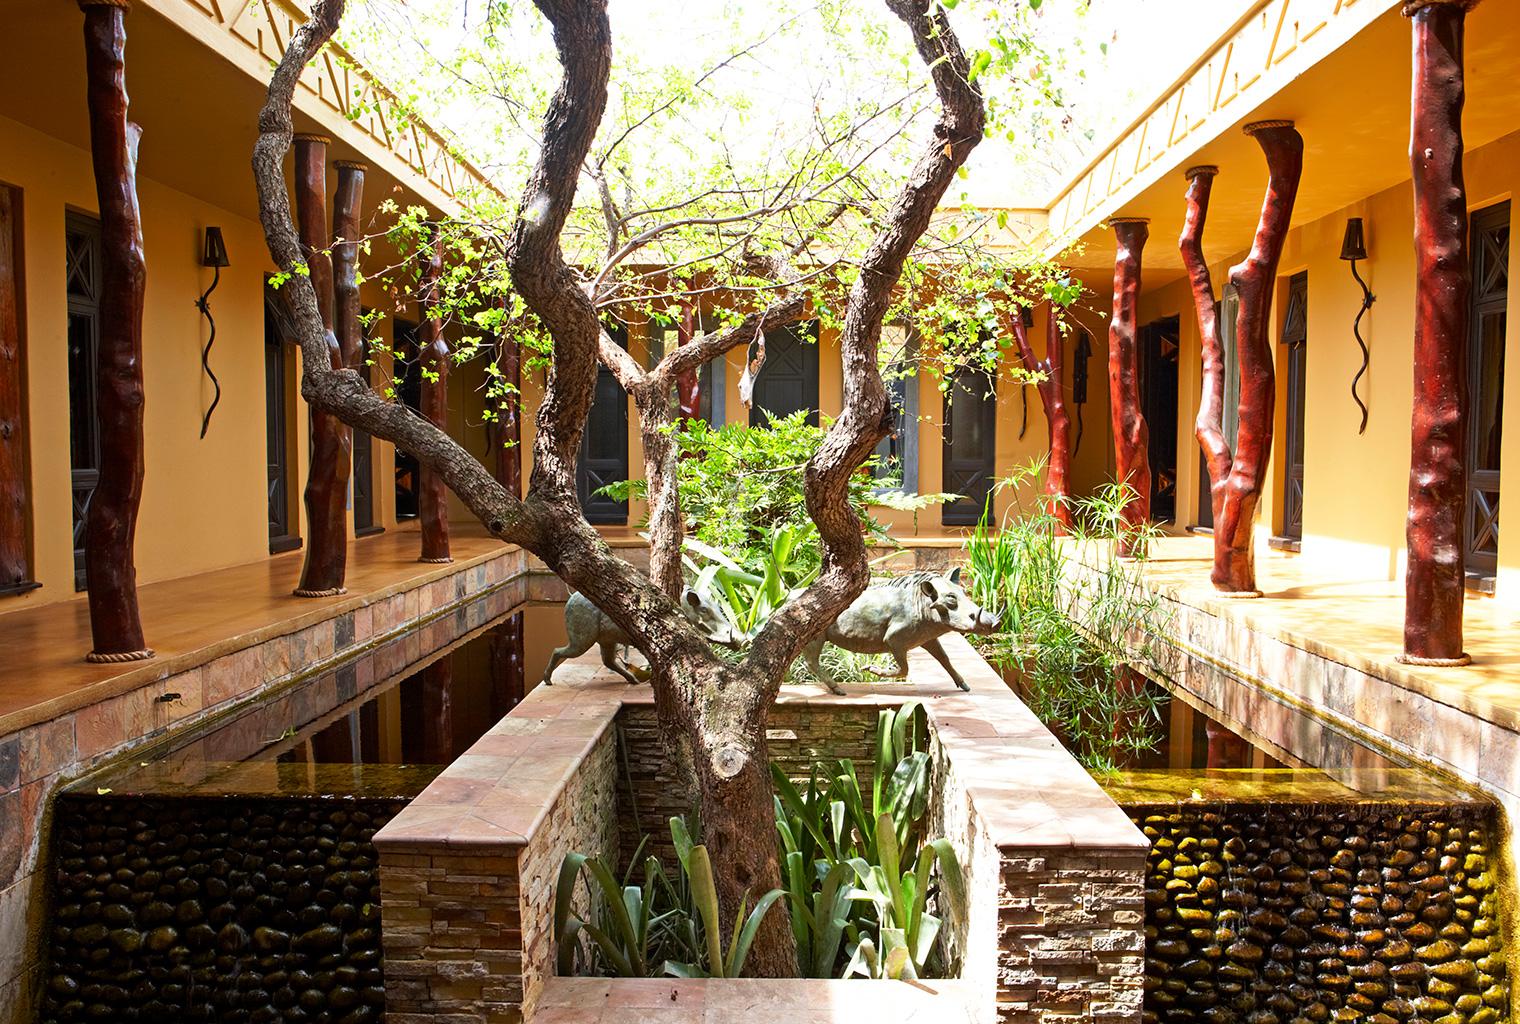 Thanda-Villa-Izulu-South-Africa-Courtyard